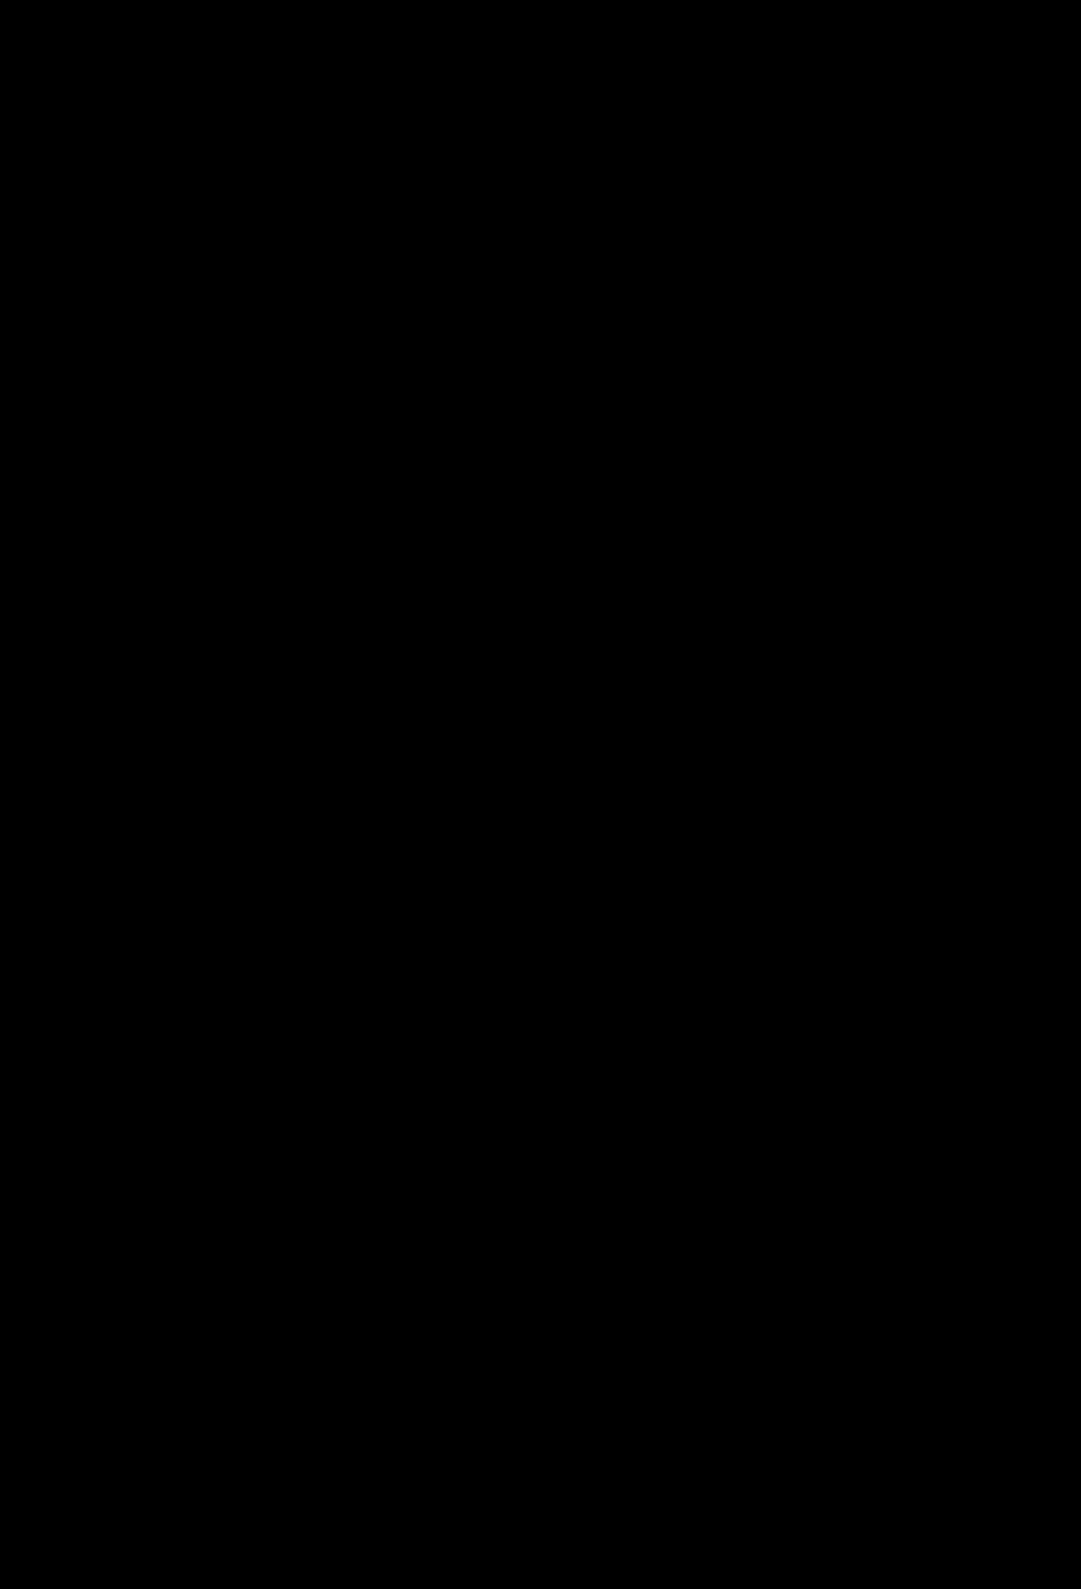 Panthers Logo Black Panther Mask Outline Png Download Panther Logo Black Panther Symbol Black Panther